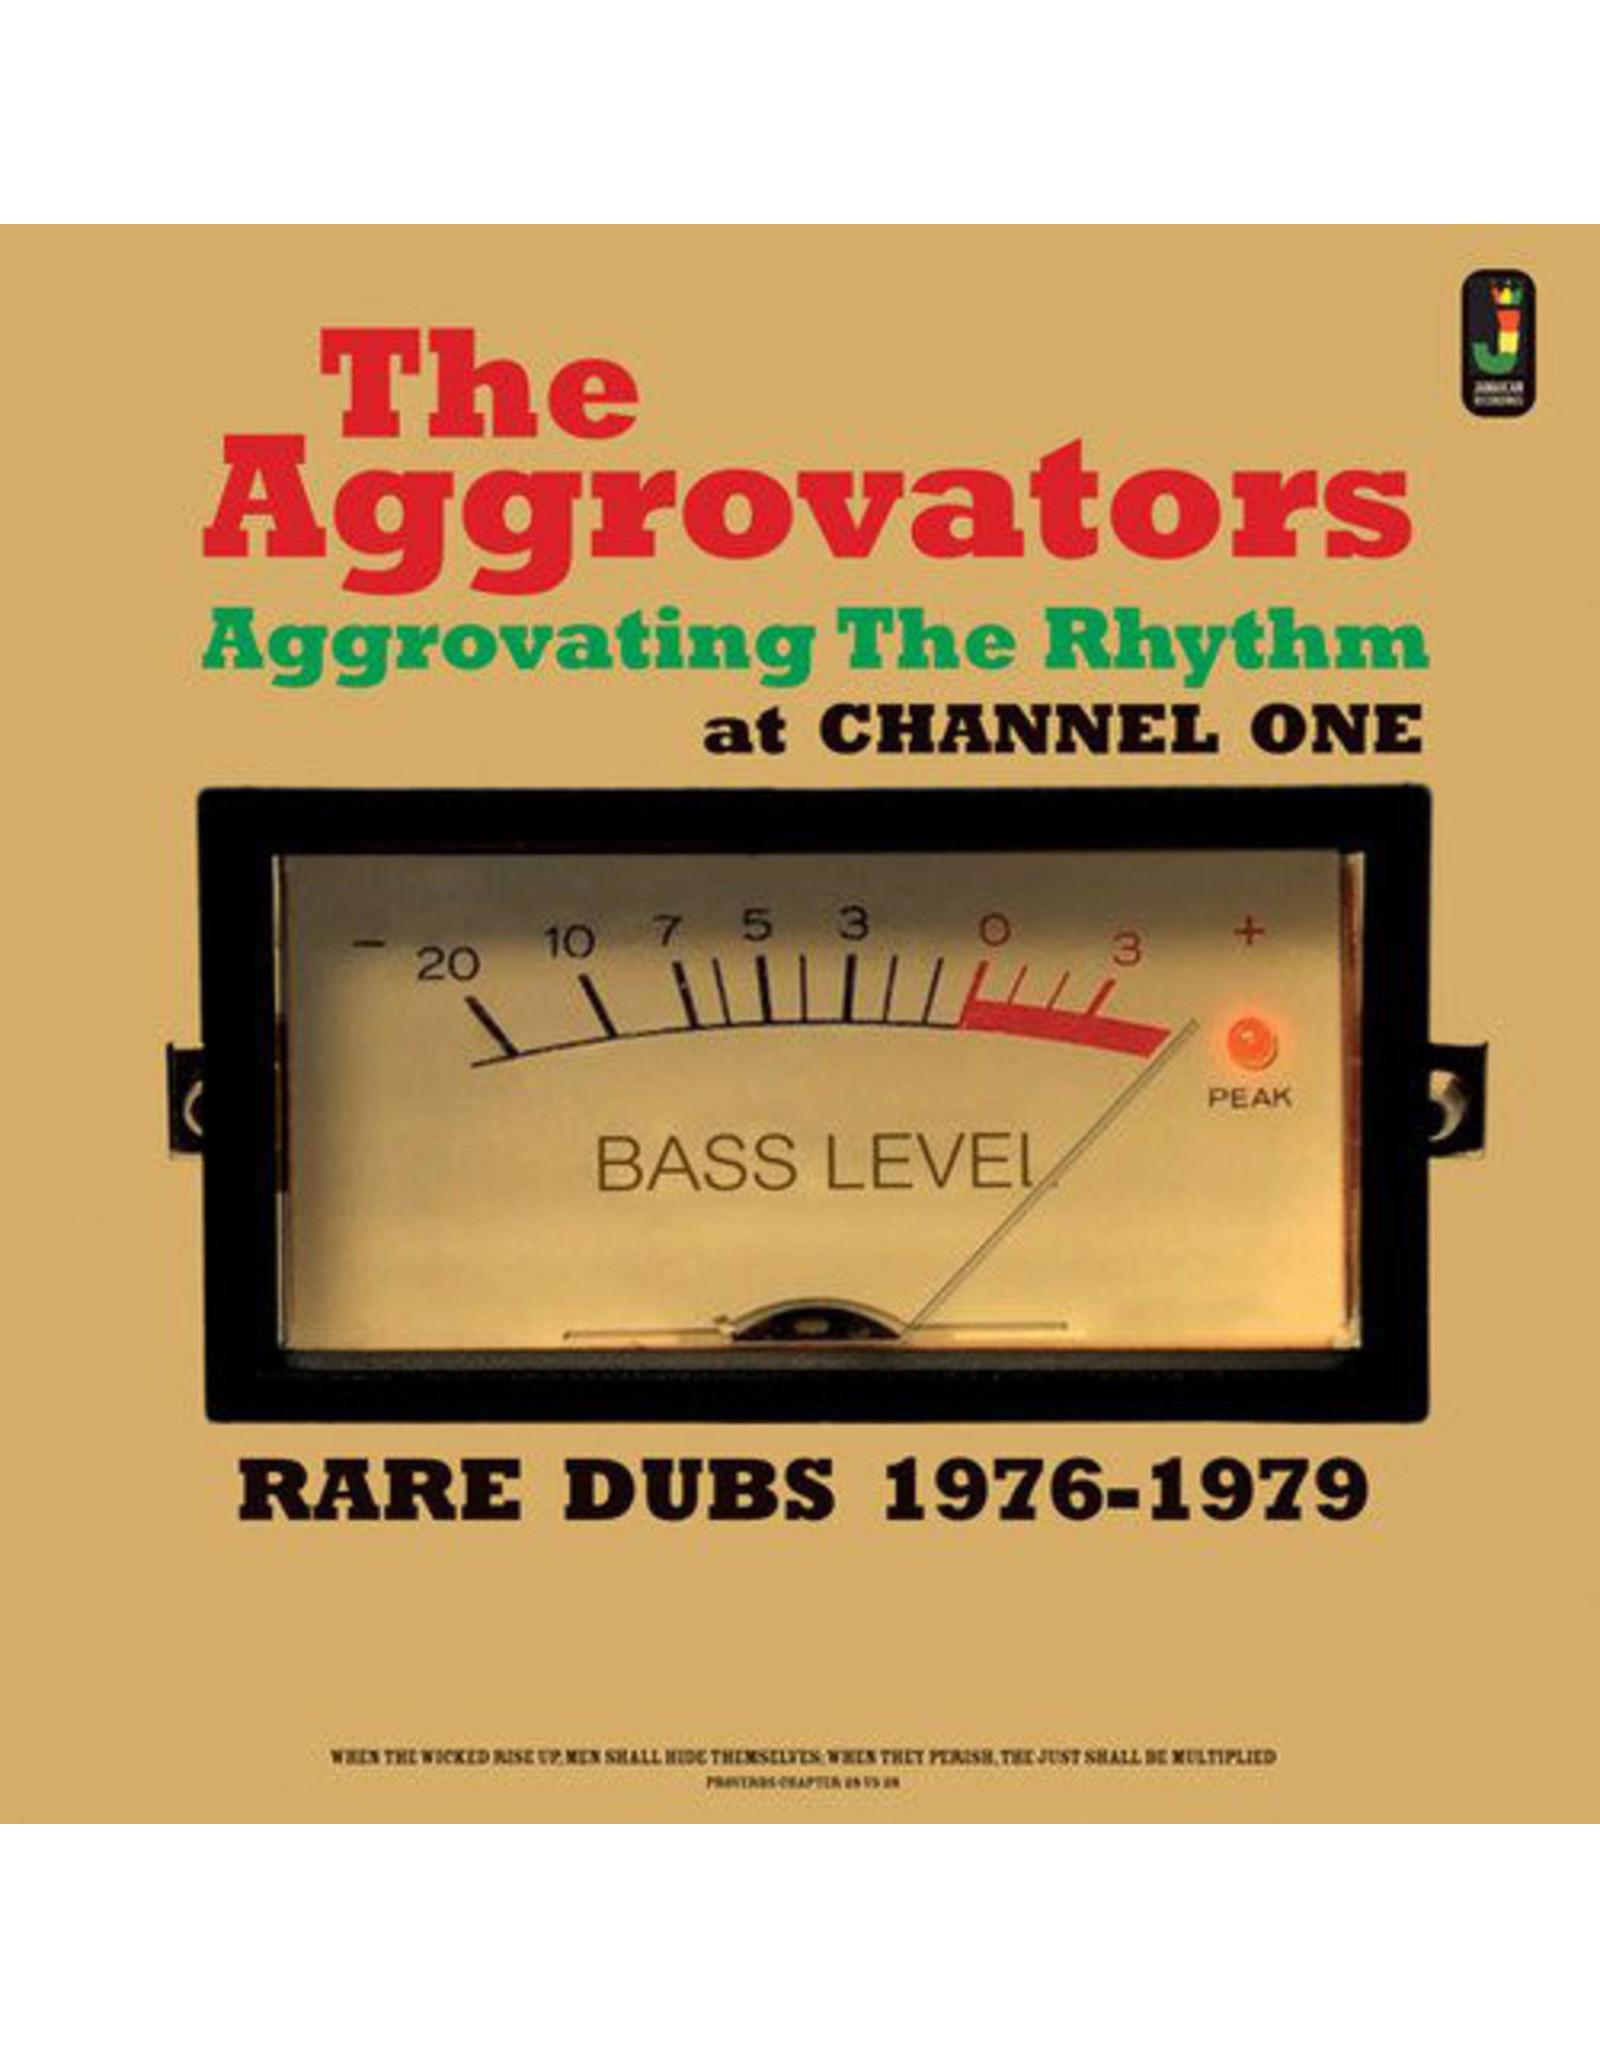 New Vinyl The Aggrovators - Aggrovating The Rhythm: Rare Dubs 1976-1979 LP